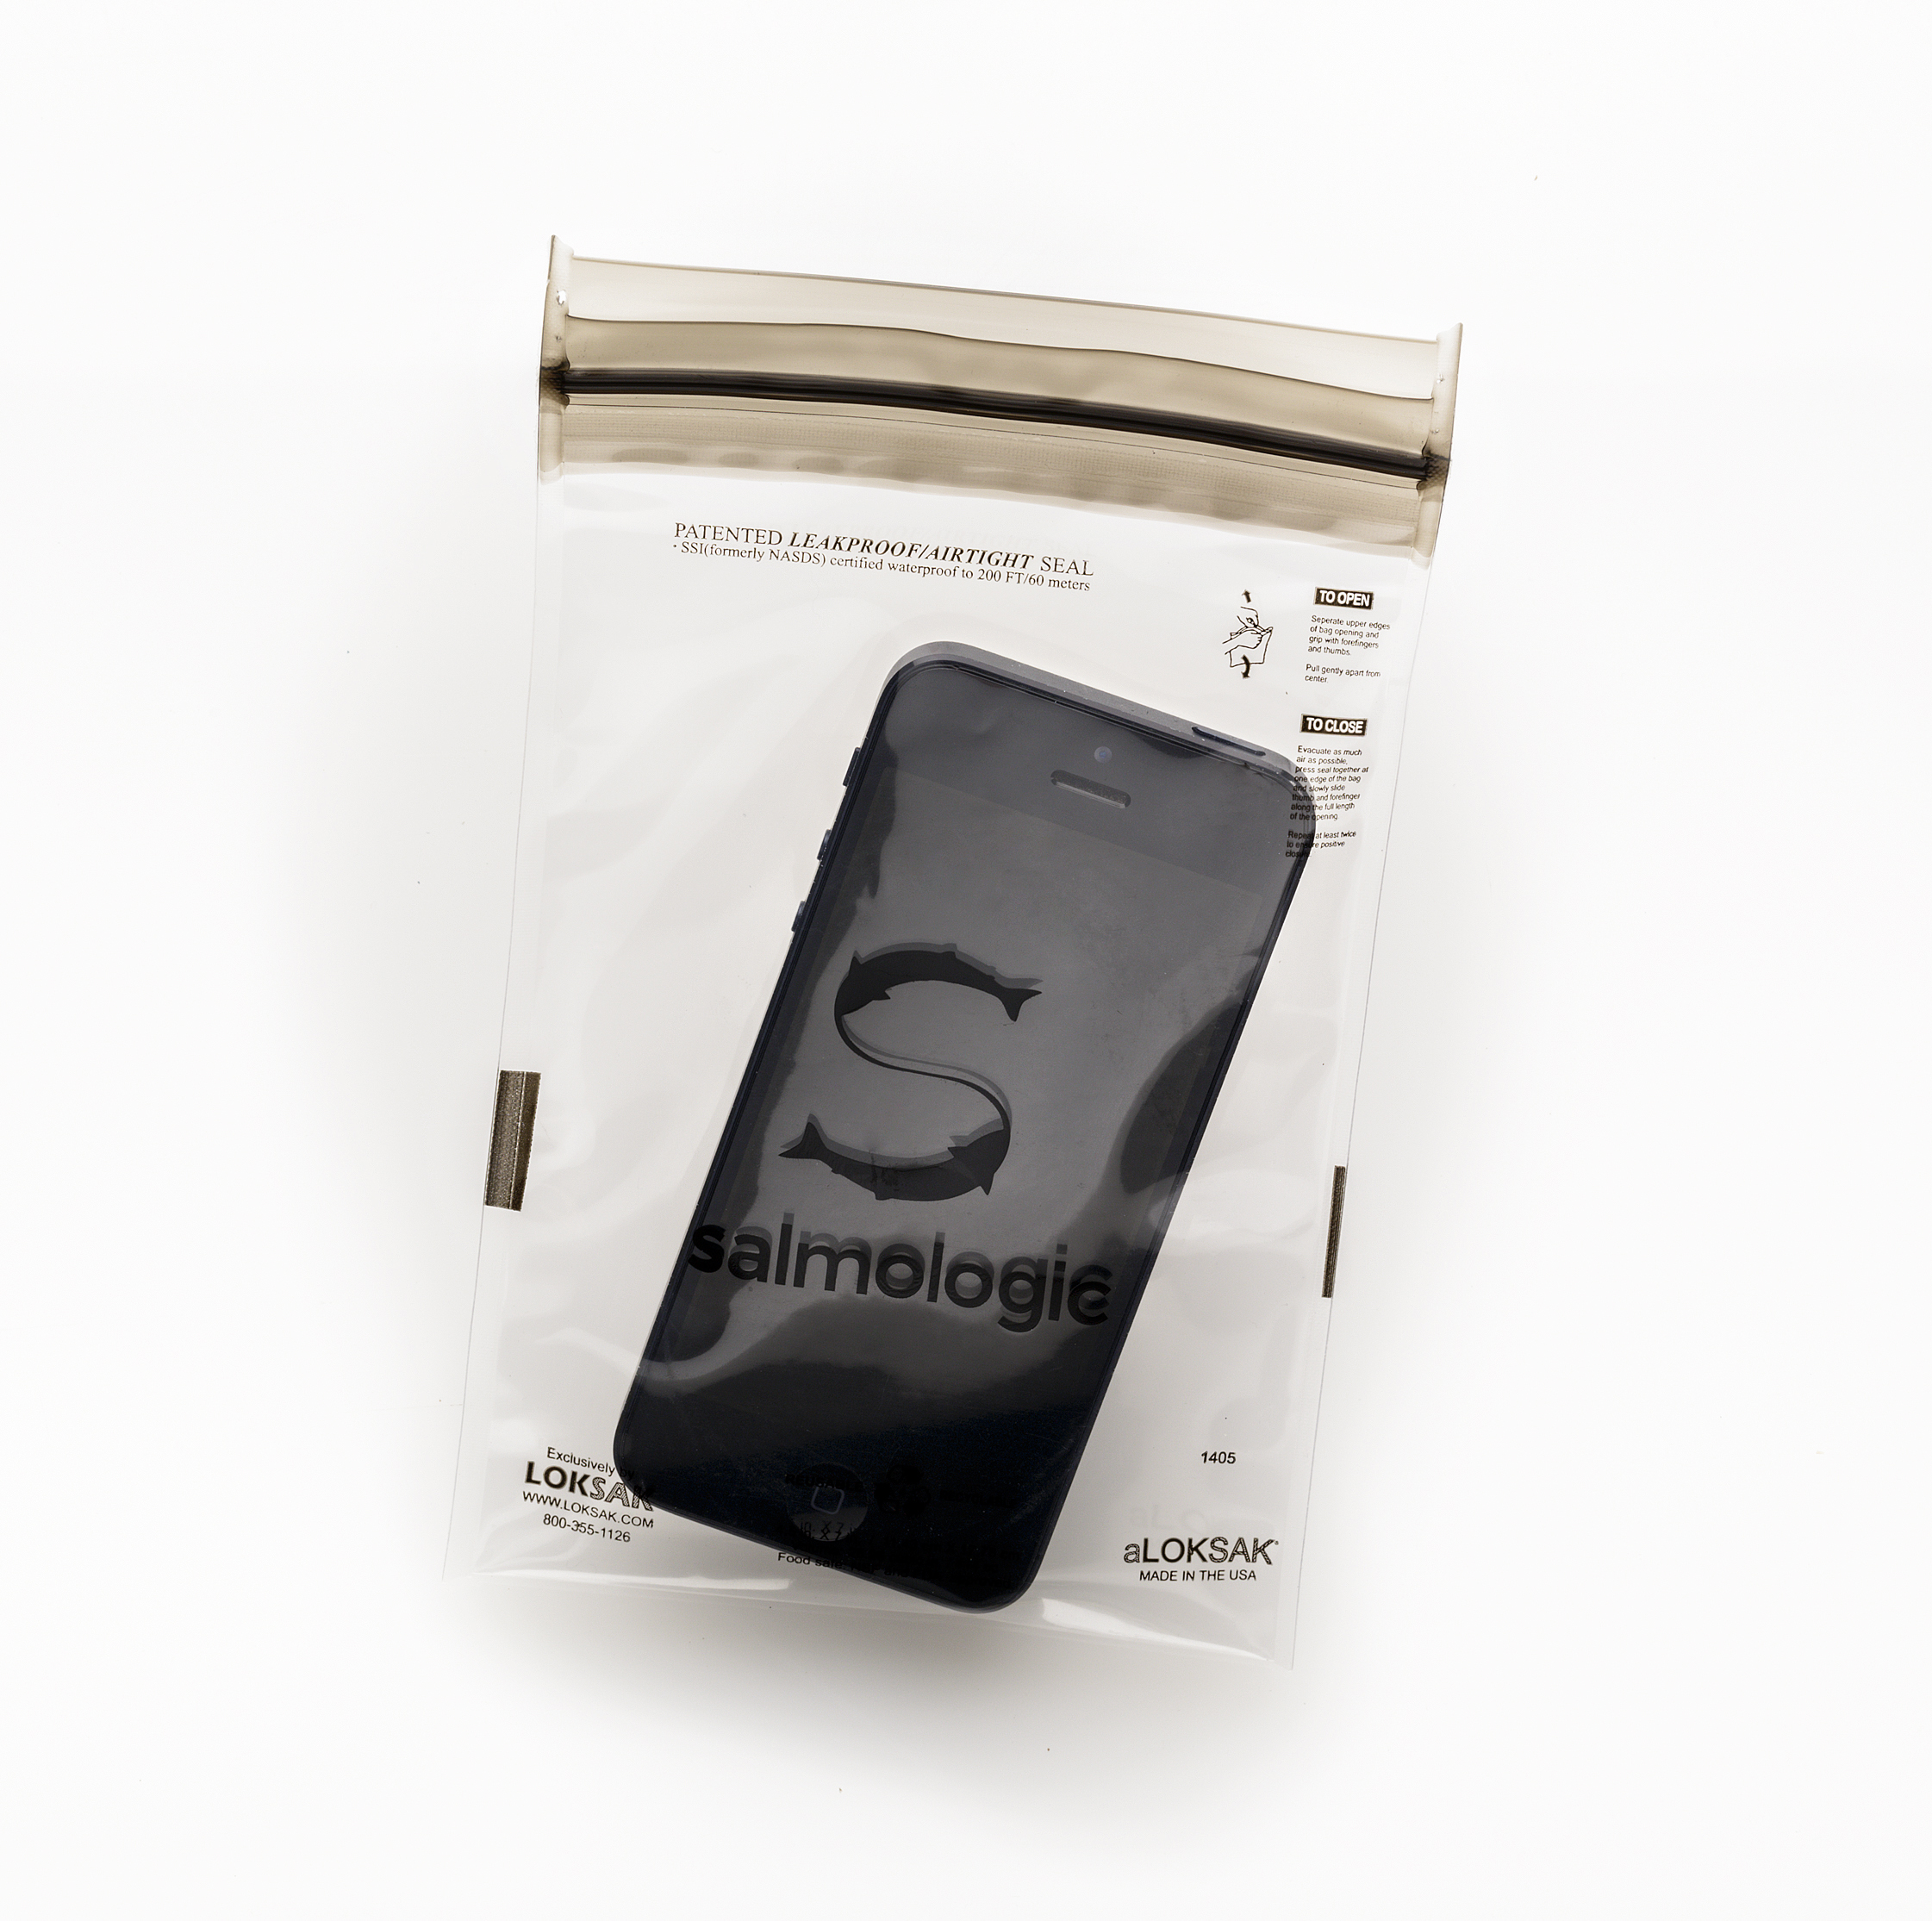 Reuse-able lok-sak bag replacing old fly line packaging.